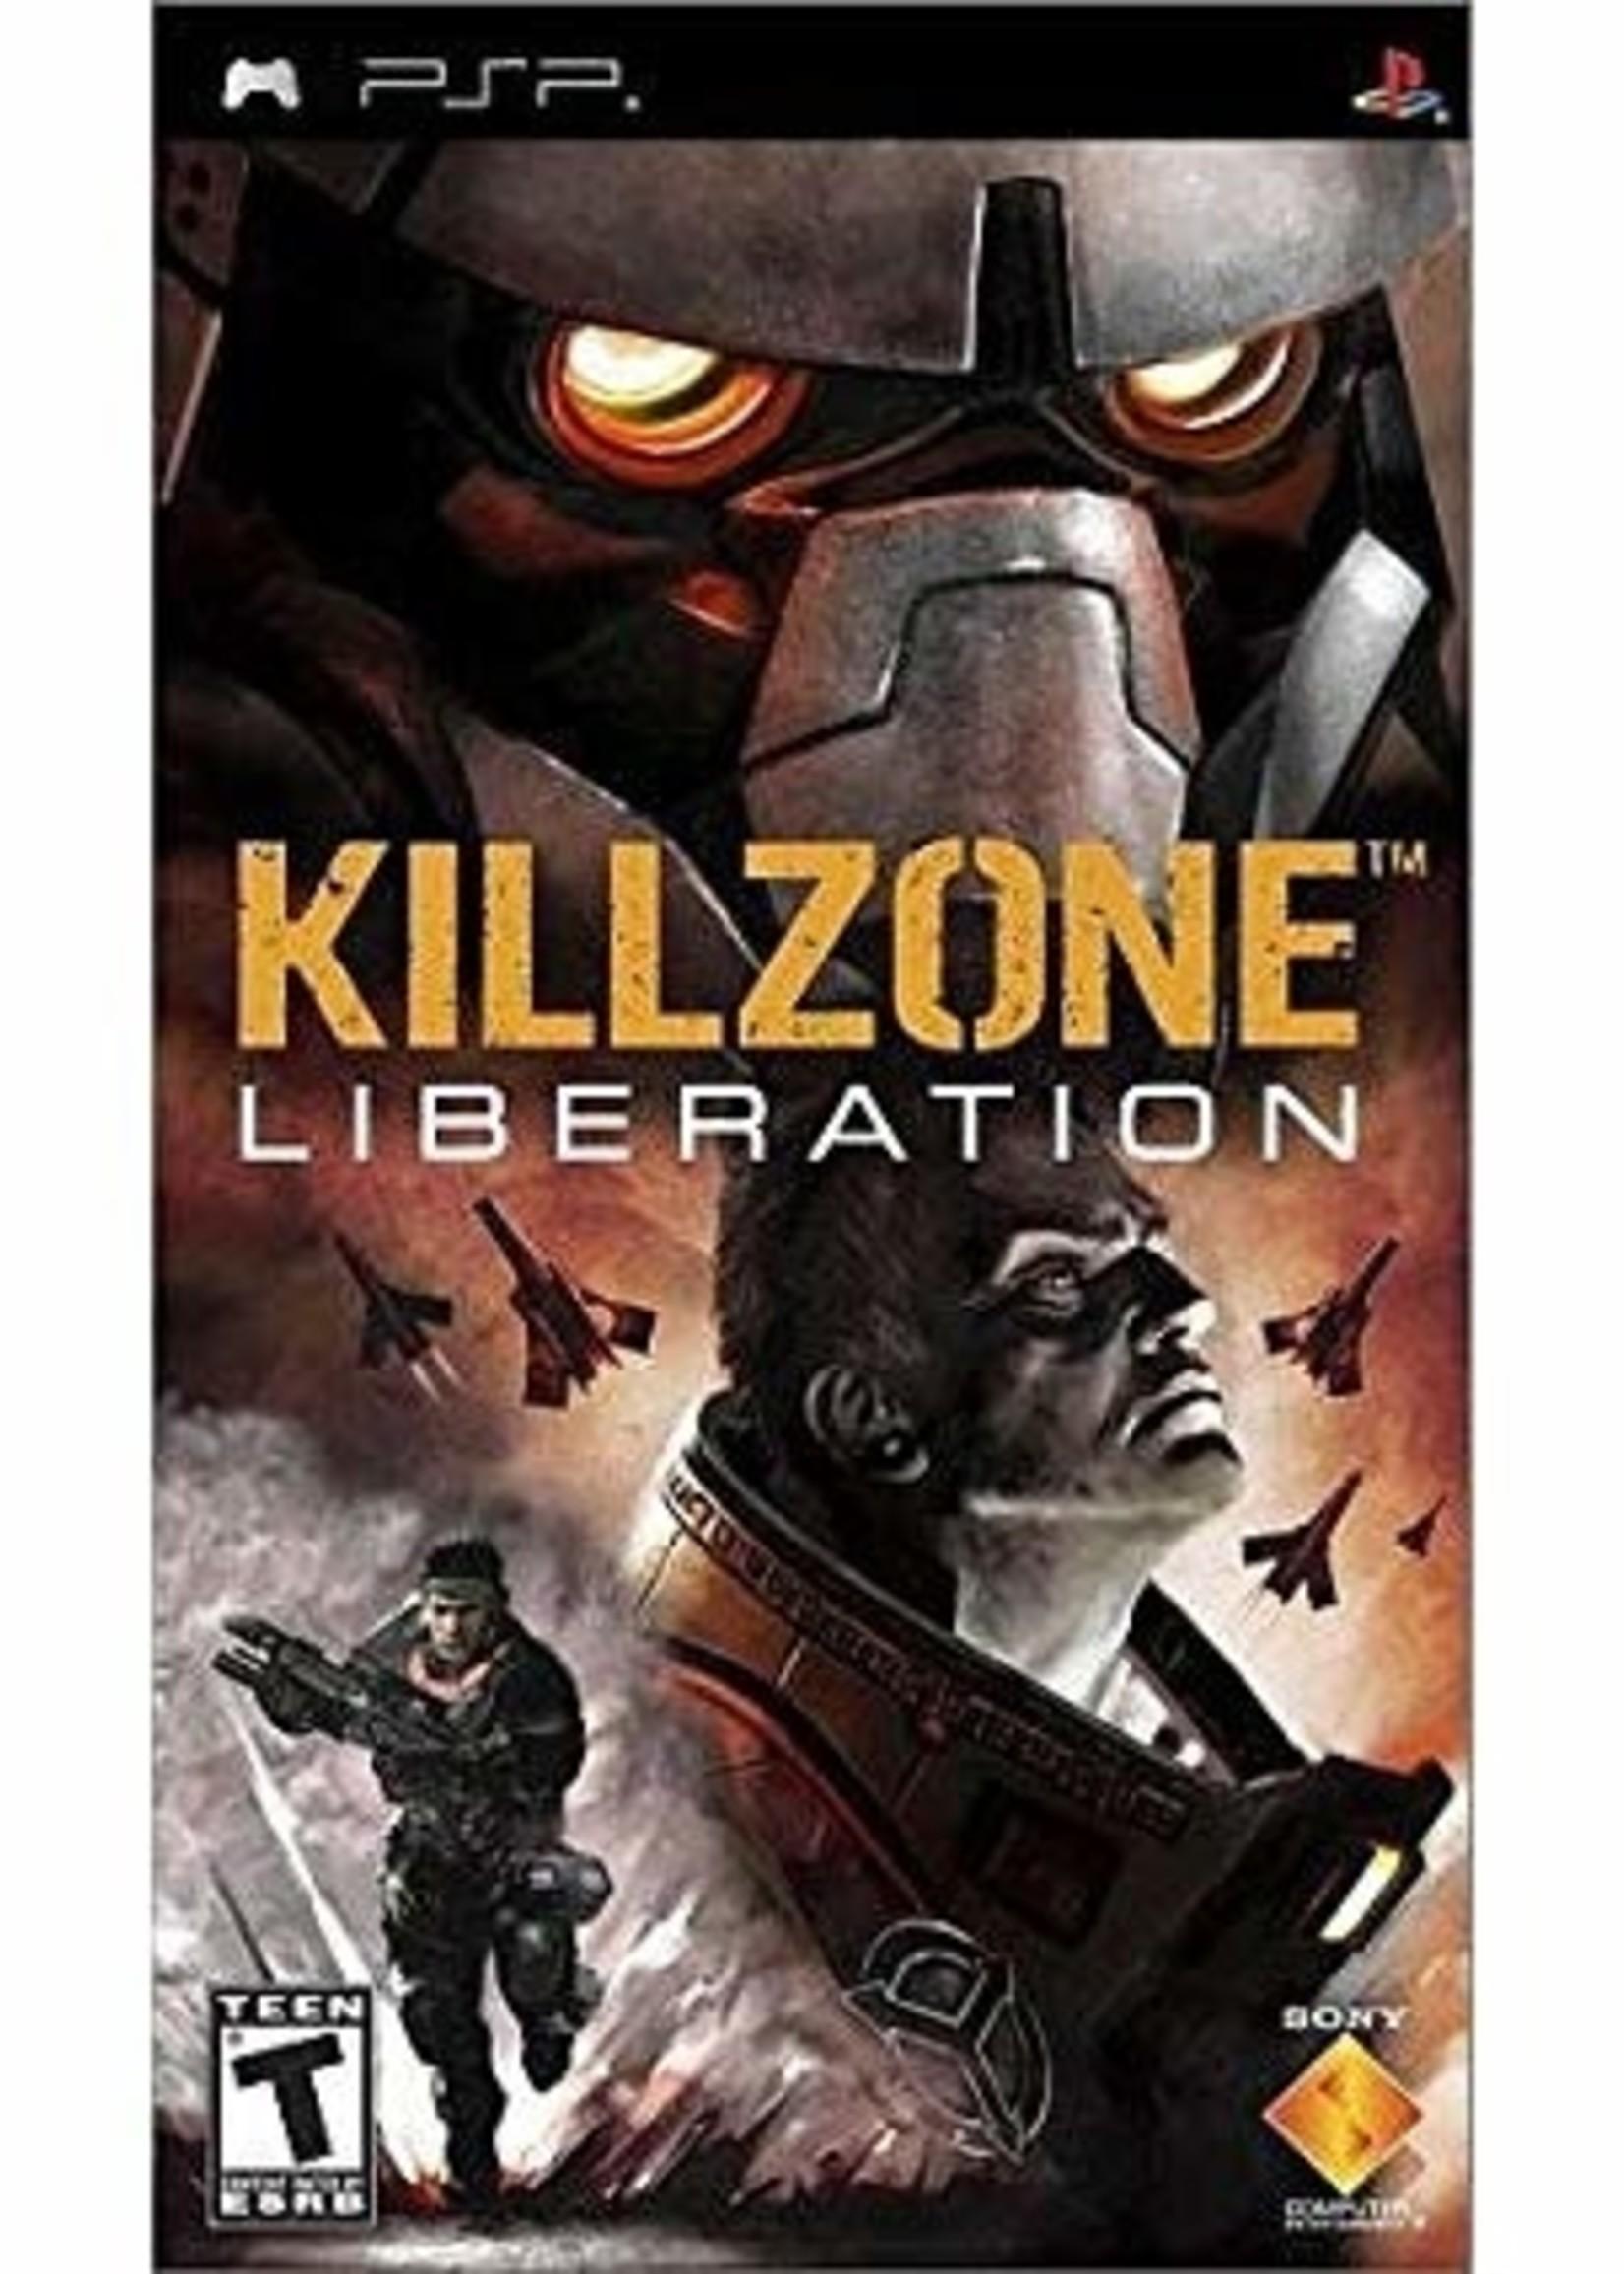 Killzone Liberation - PSV PrePlayed